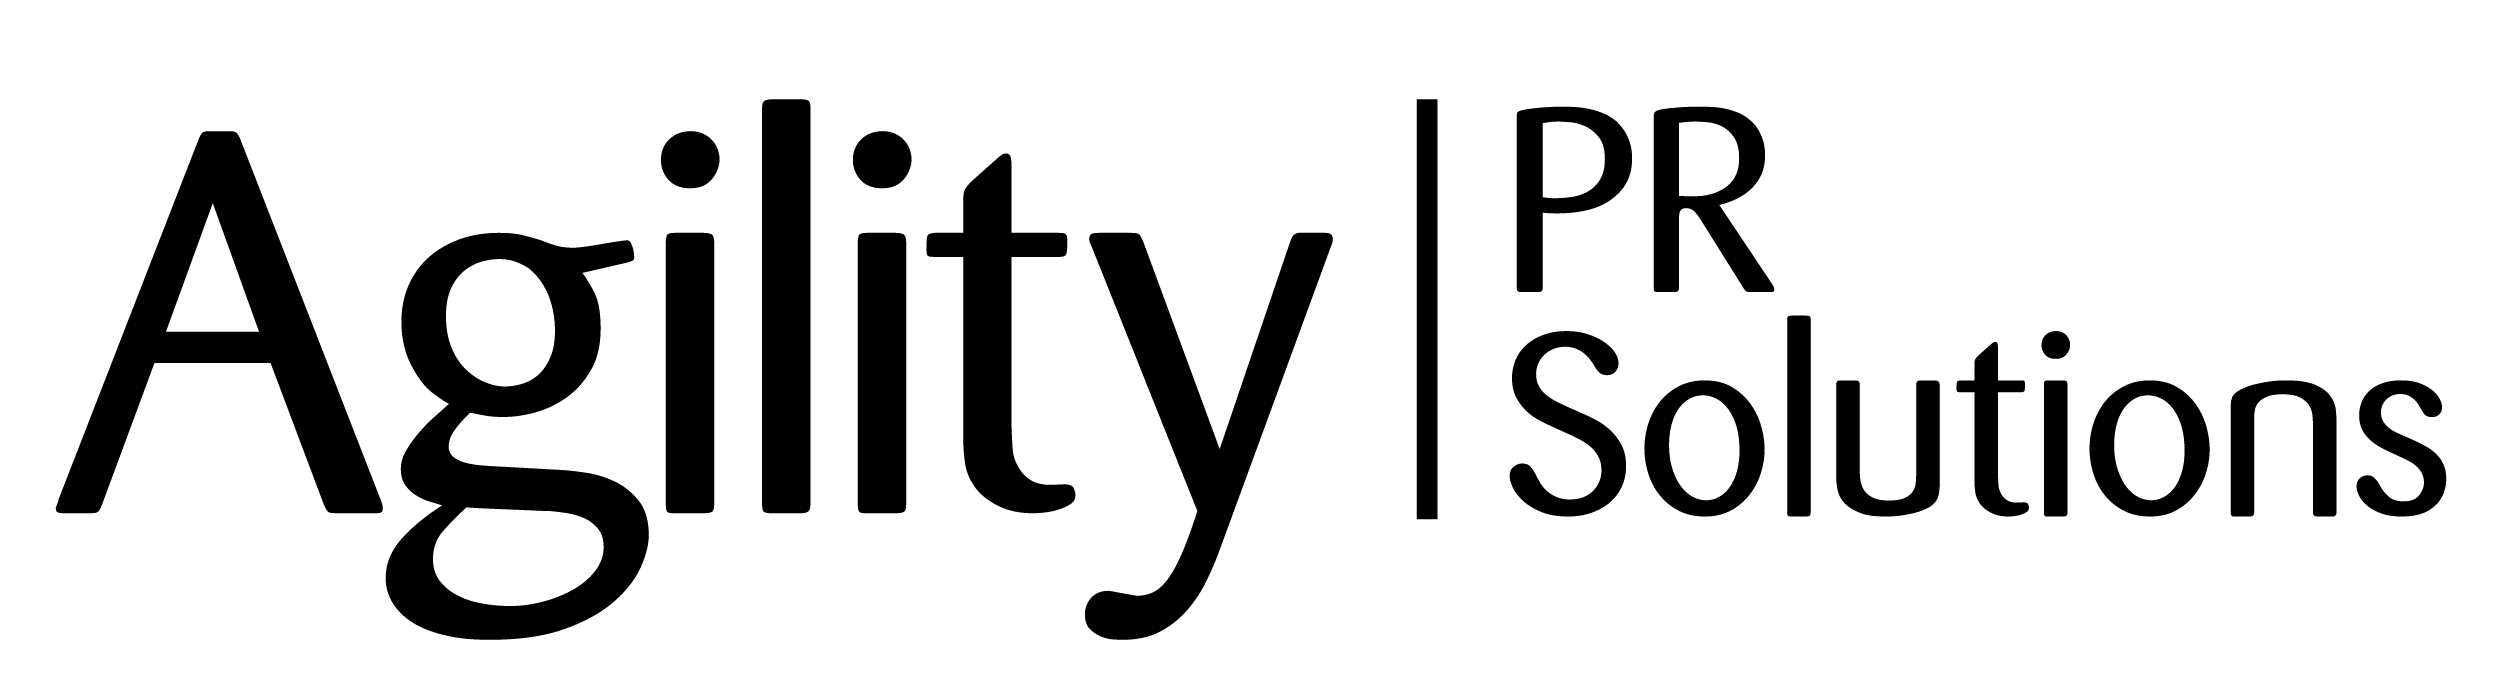 Agility PR Solutions Logo